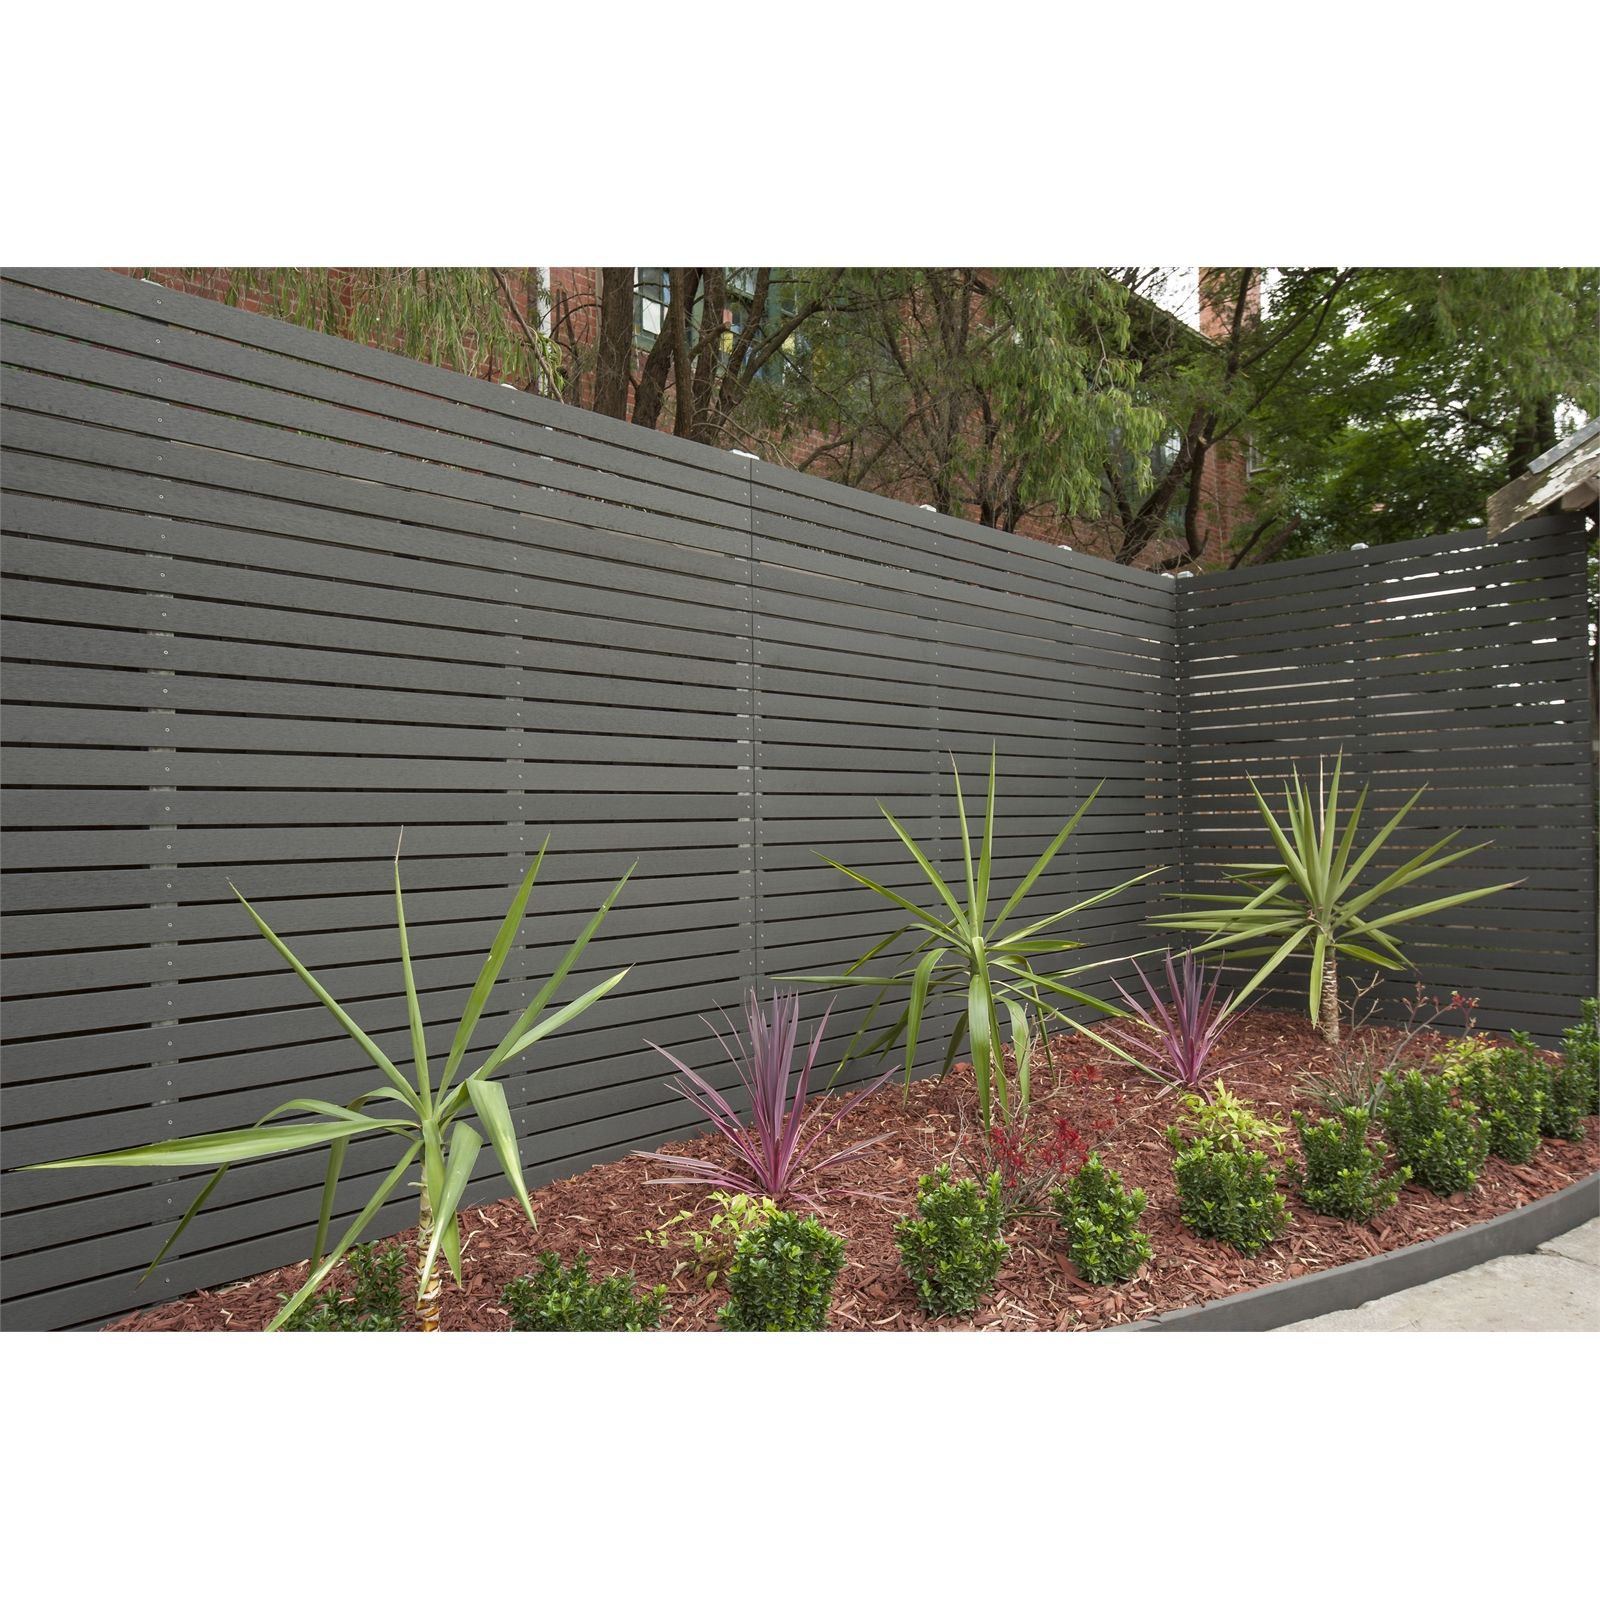 Ekodeck 67 X 15mm 2 7m Greystone Composite Screening Small Front Yard Landscaping Outdoor Backyard Backyard Landscaping